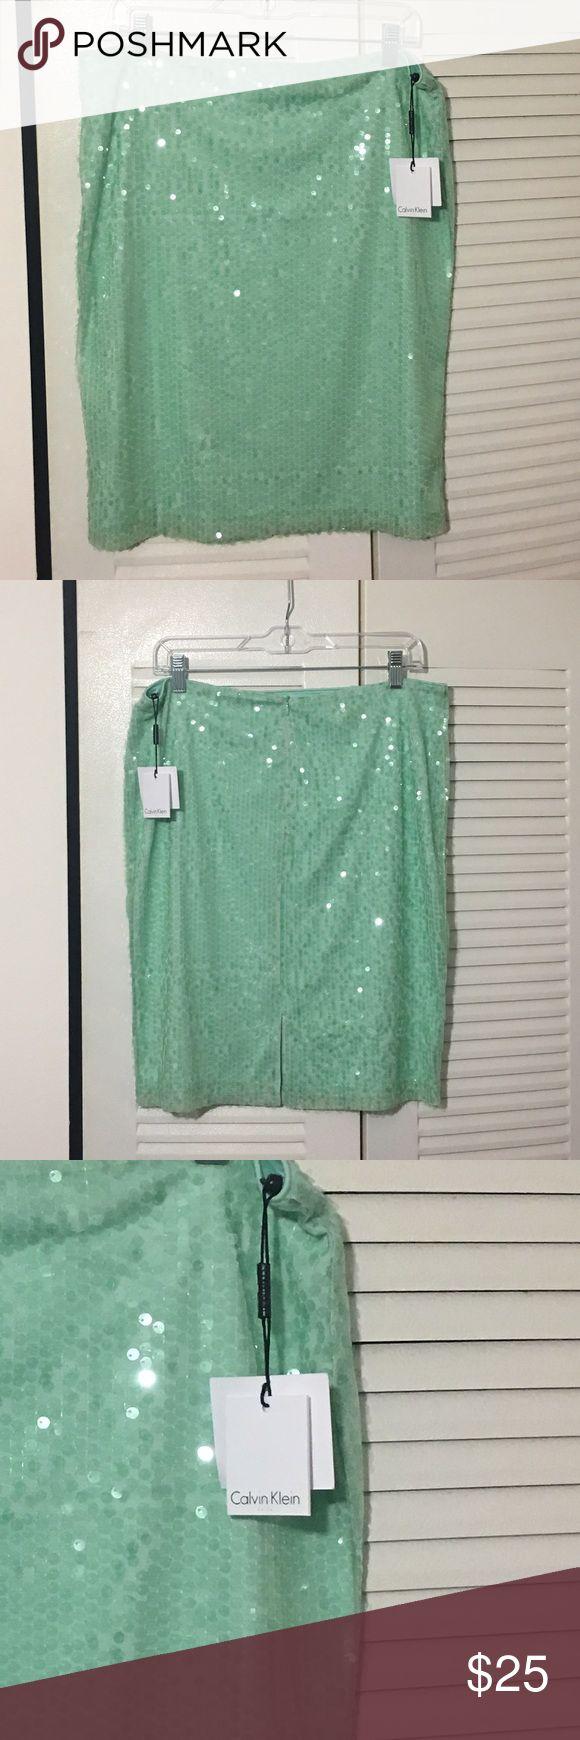 "NWT CALVIN KLEIN MINT GREEN SEQUIN SKIRT SIZE M /L CK Mint Green Sequin Skirt. Actual Measurements While Laid Flat 16.5""w At Waist. Top Of Waist Down 22.5""L Calvin Klein Skirts"